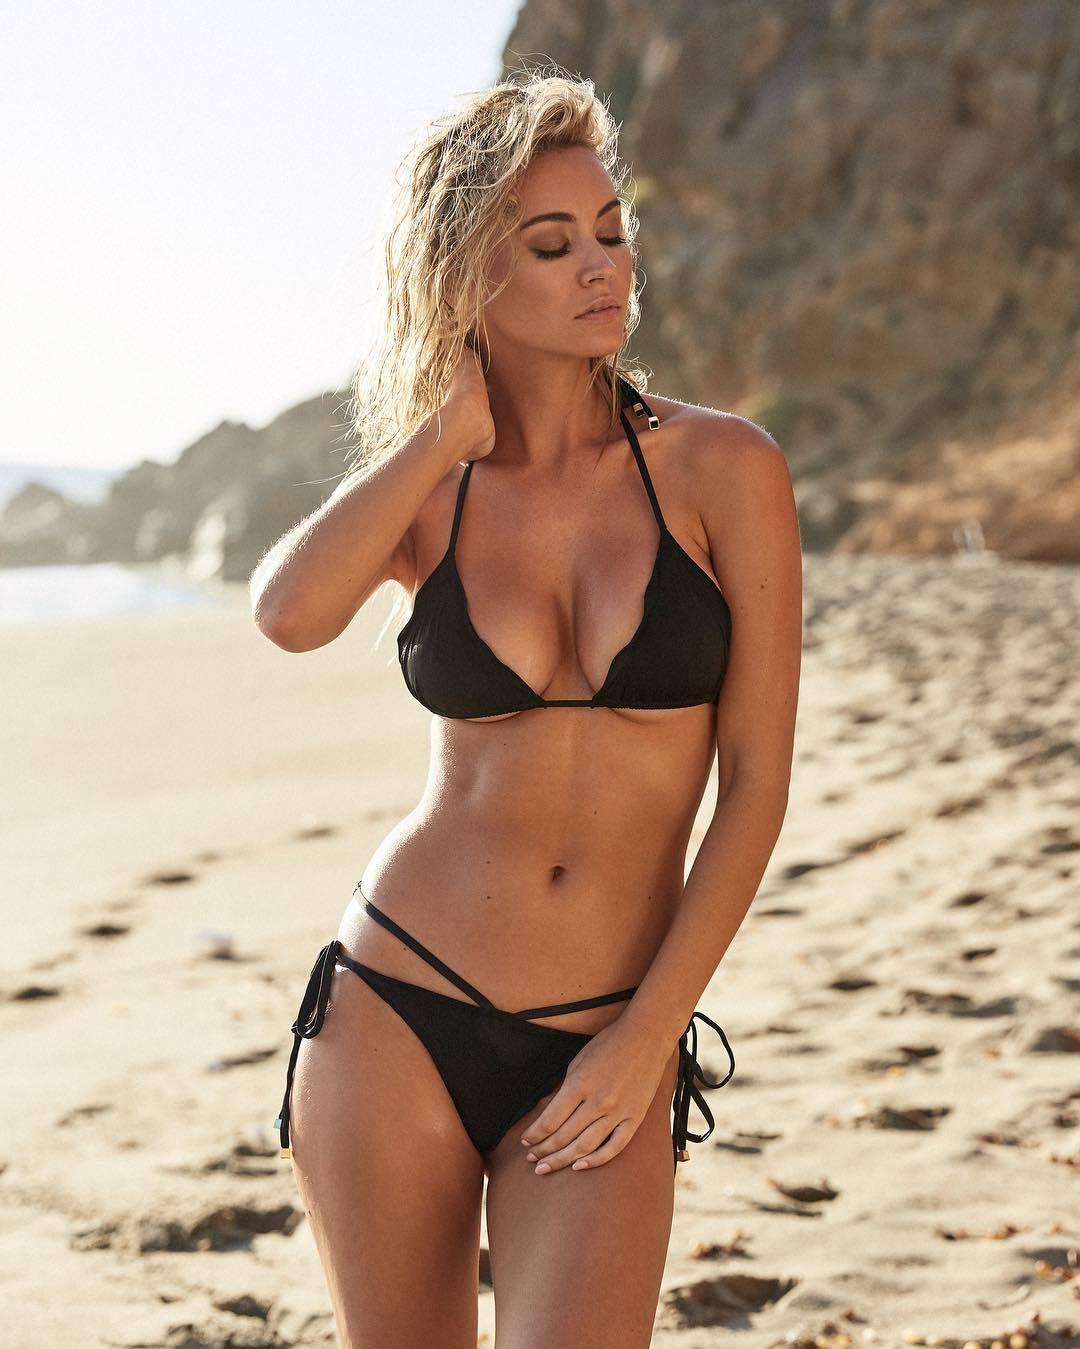 Bryana Holly - Adam Mont photoshoot